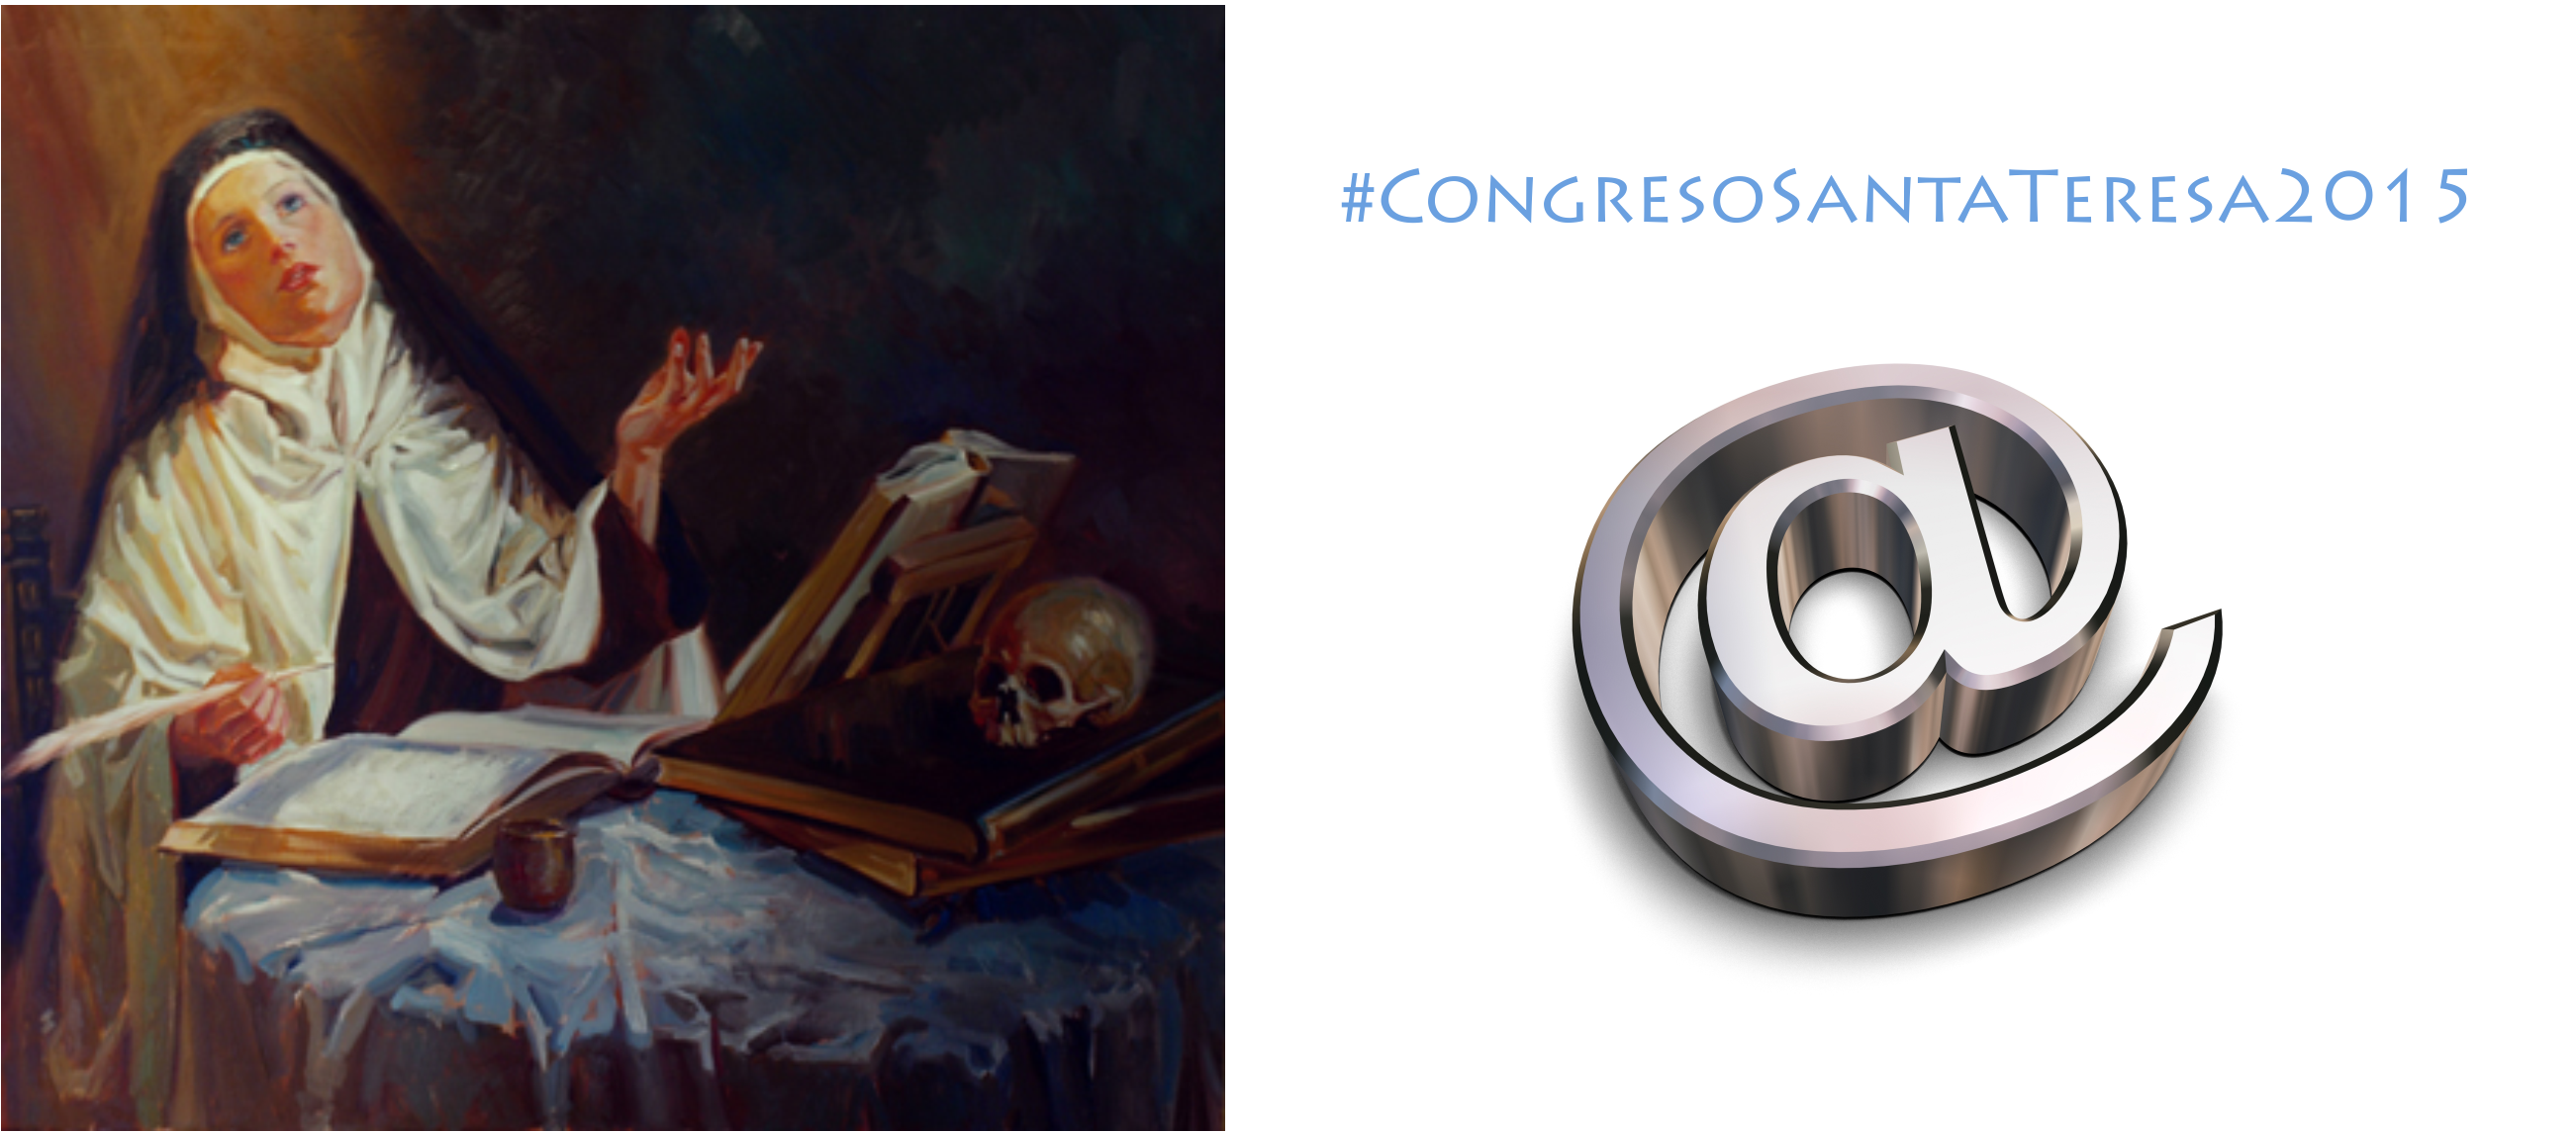 #Webs imprescindibles sobre #SantaTeresa y el #VCentenario. #CongresoSantaTeresa2015 #STJ500